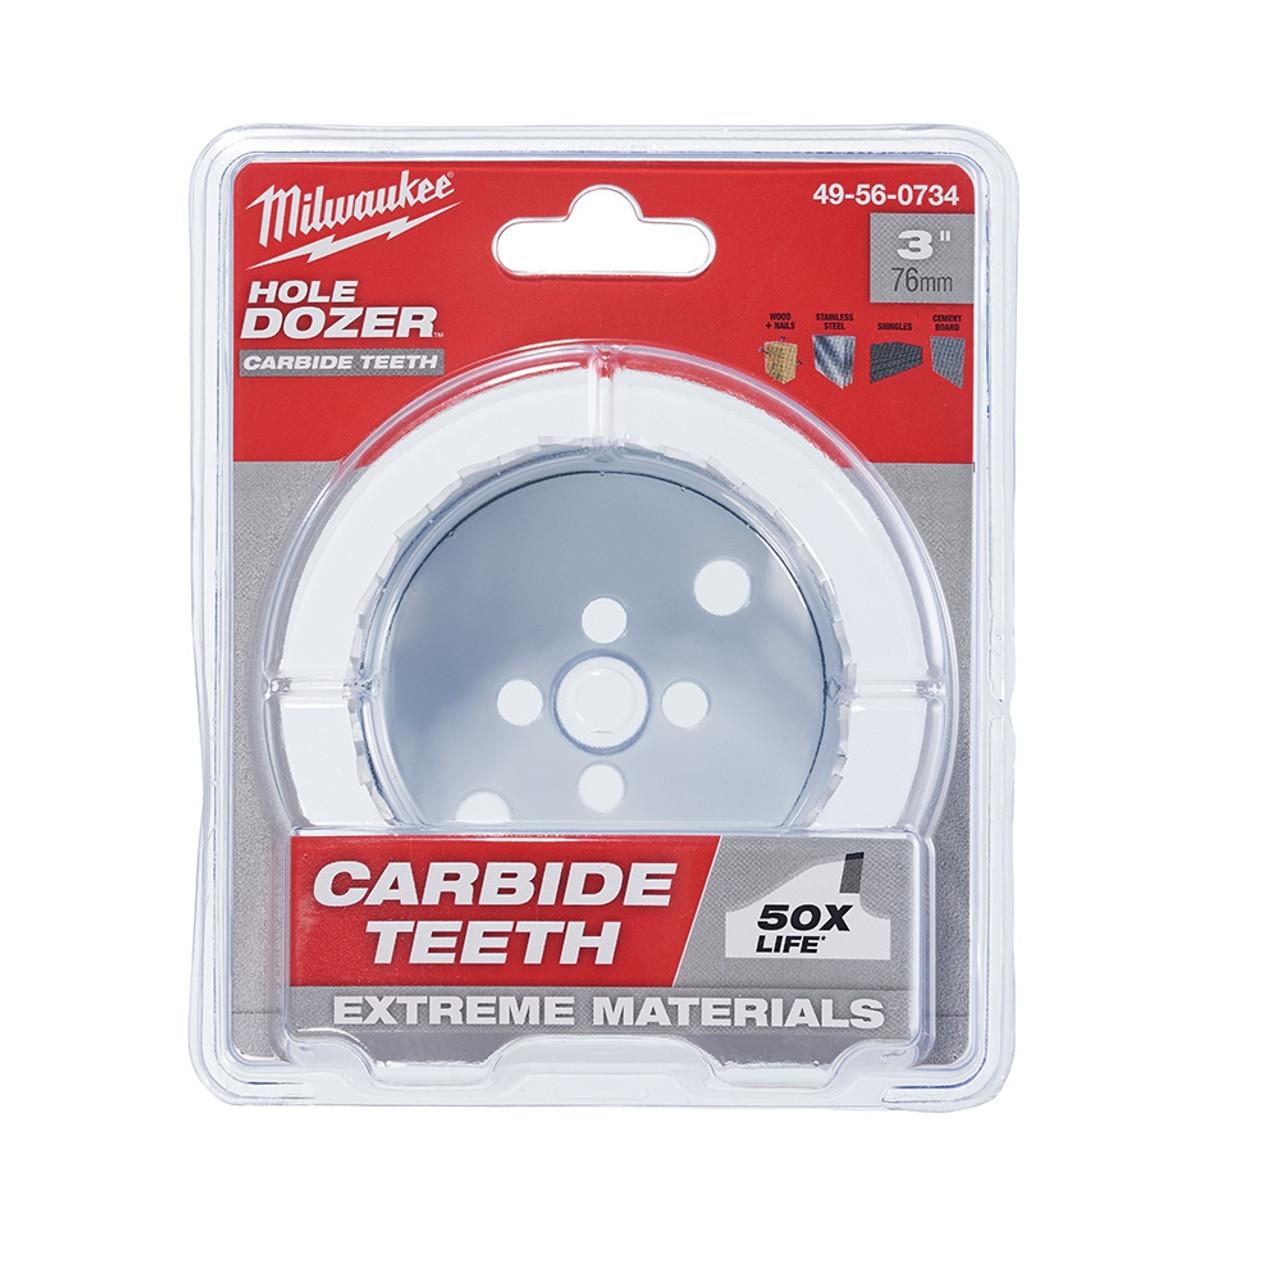 Milwaukee 49-56-0734 3 in. Hole Dozer with Carbide Teeth